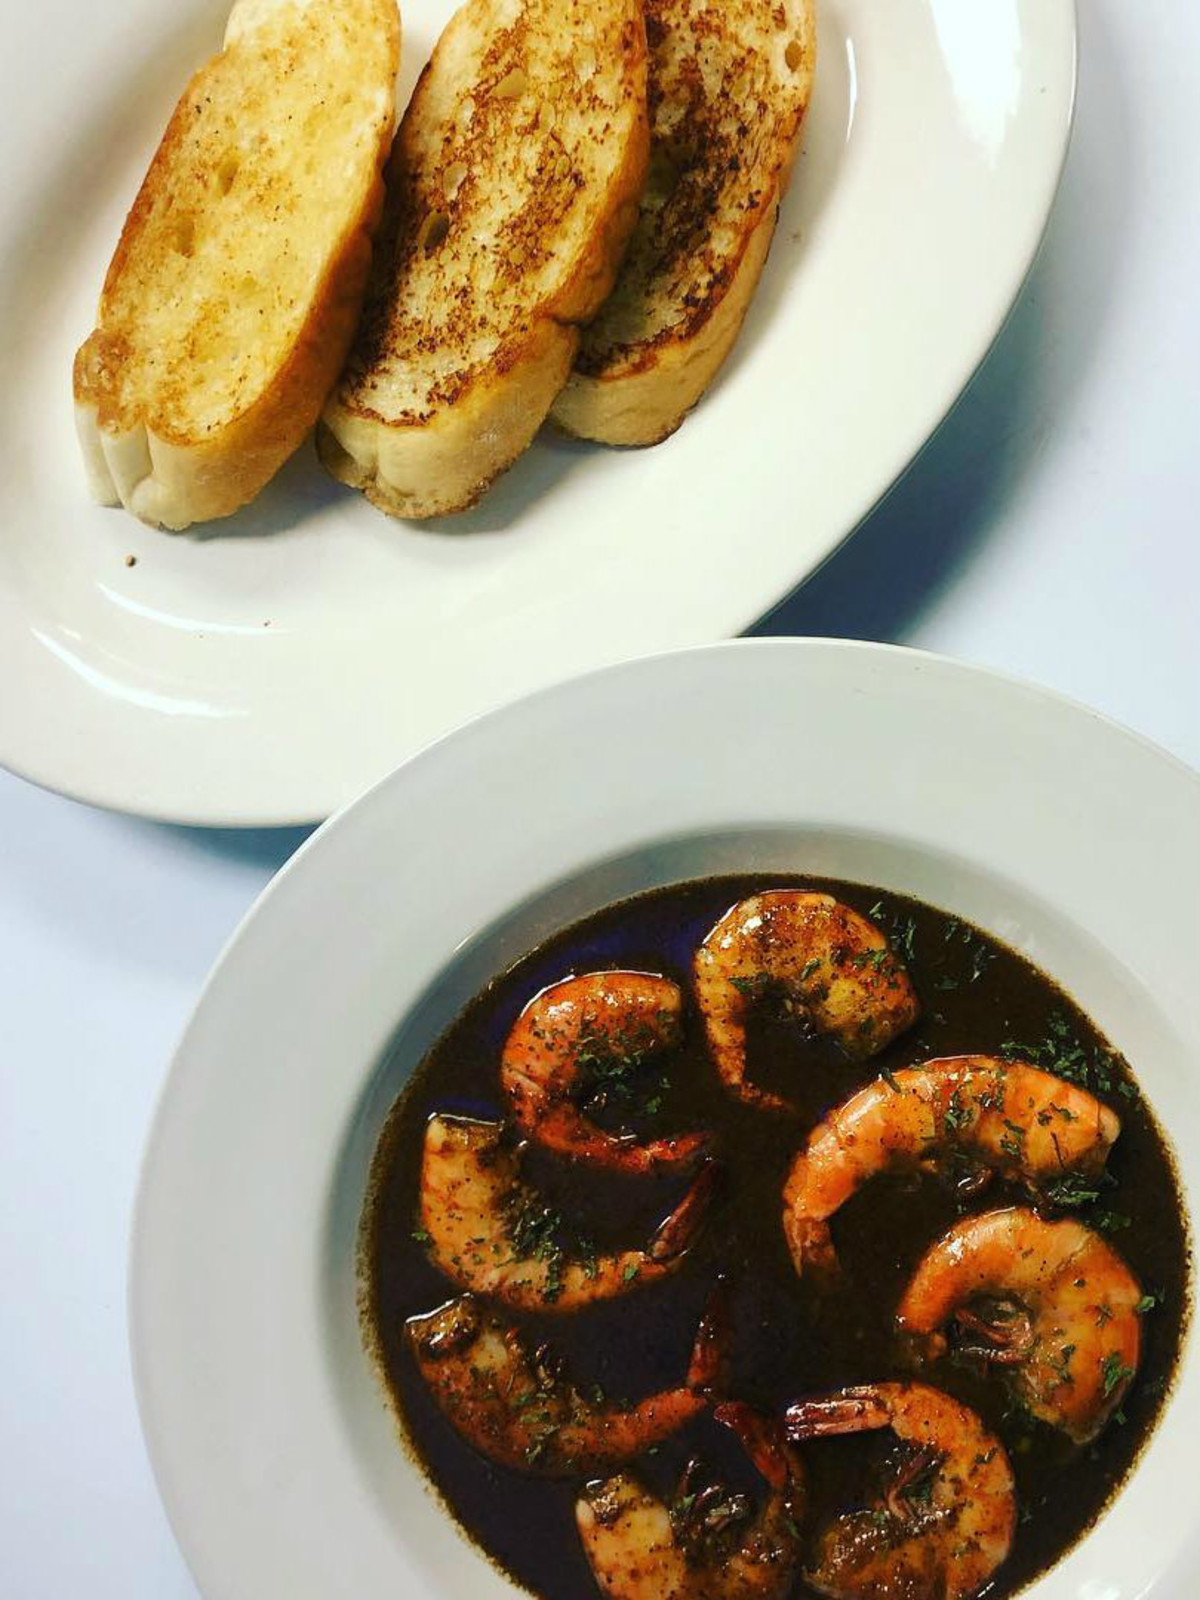 Poppy's Southern Recipes barbecue shrimp